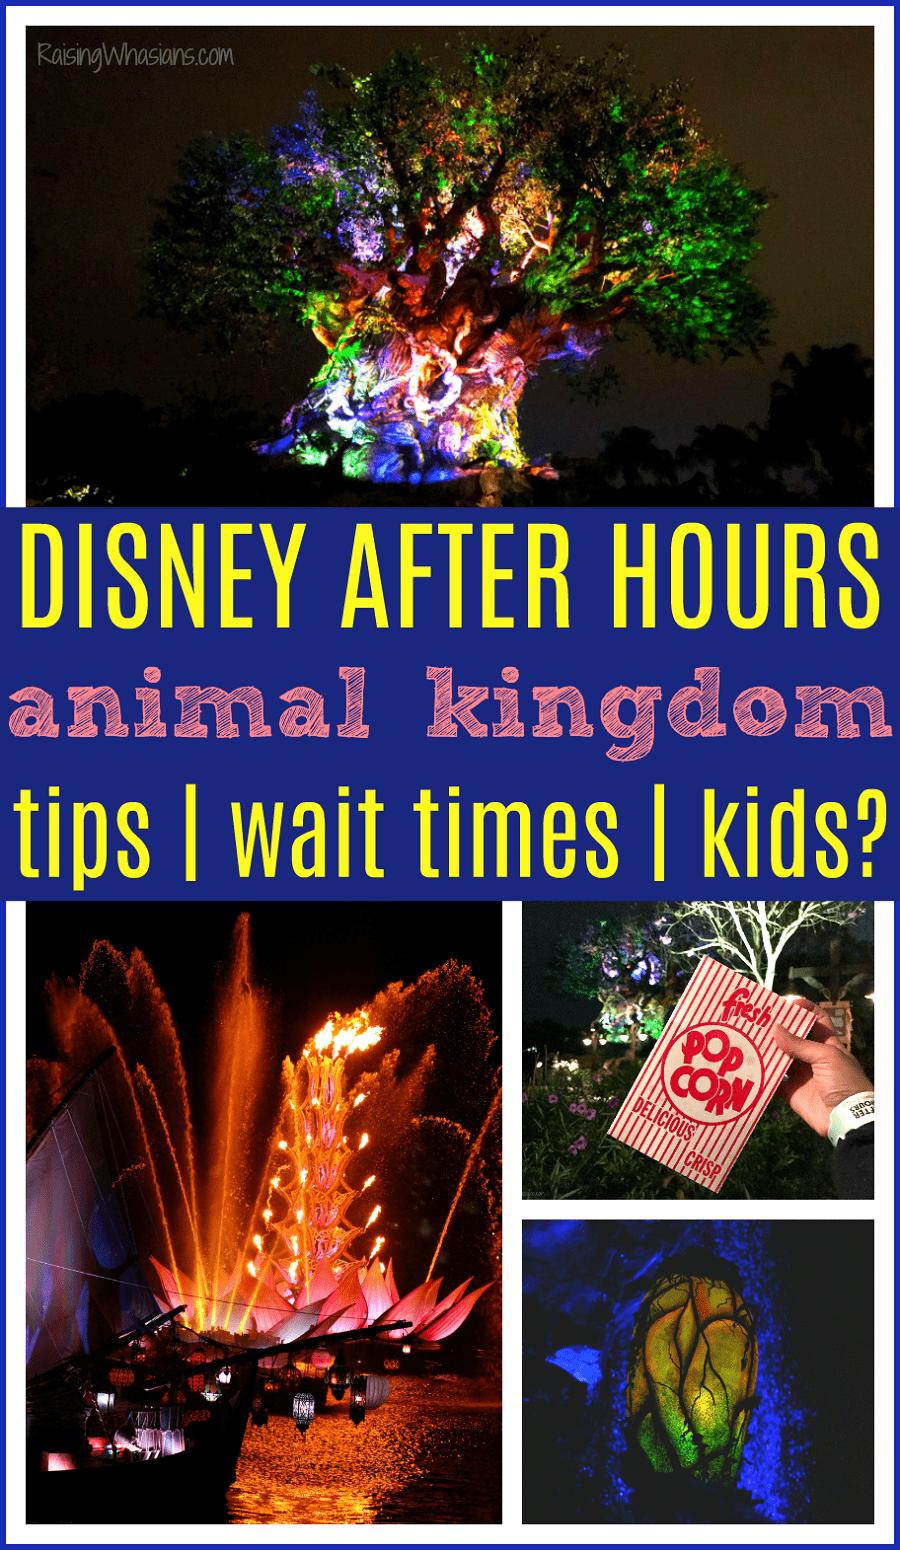 Disney after hours best tips